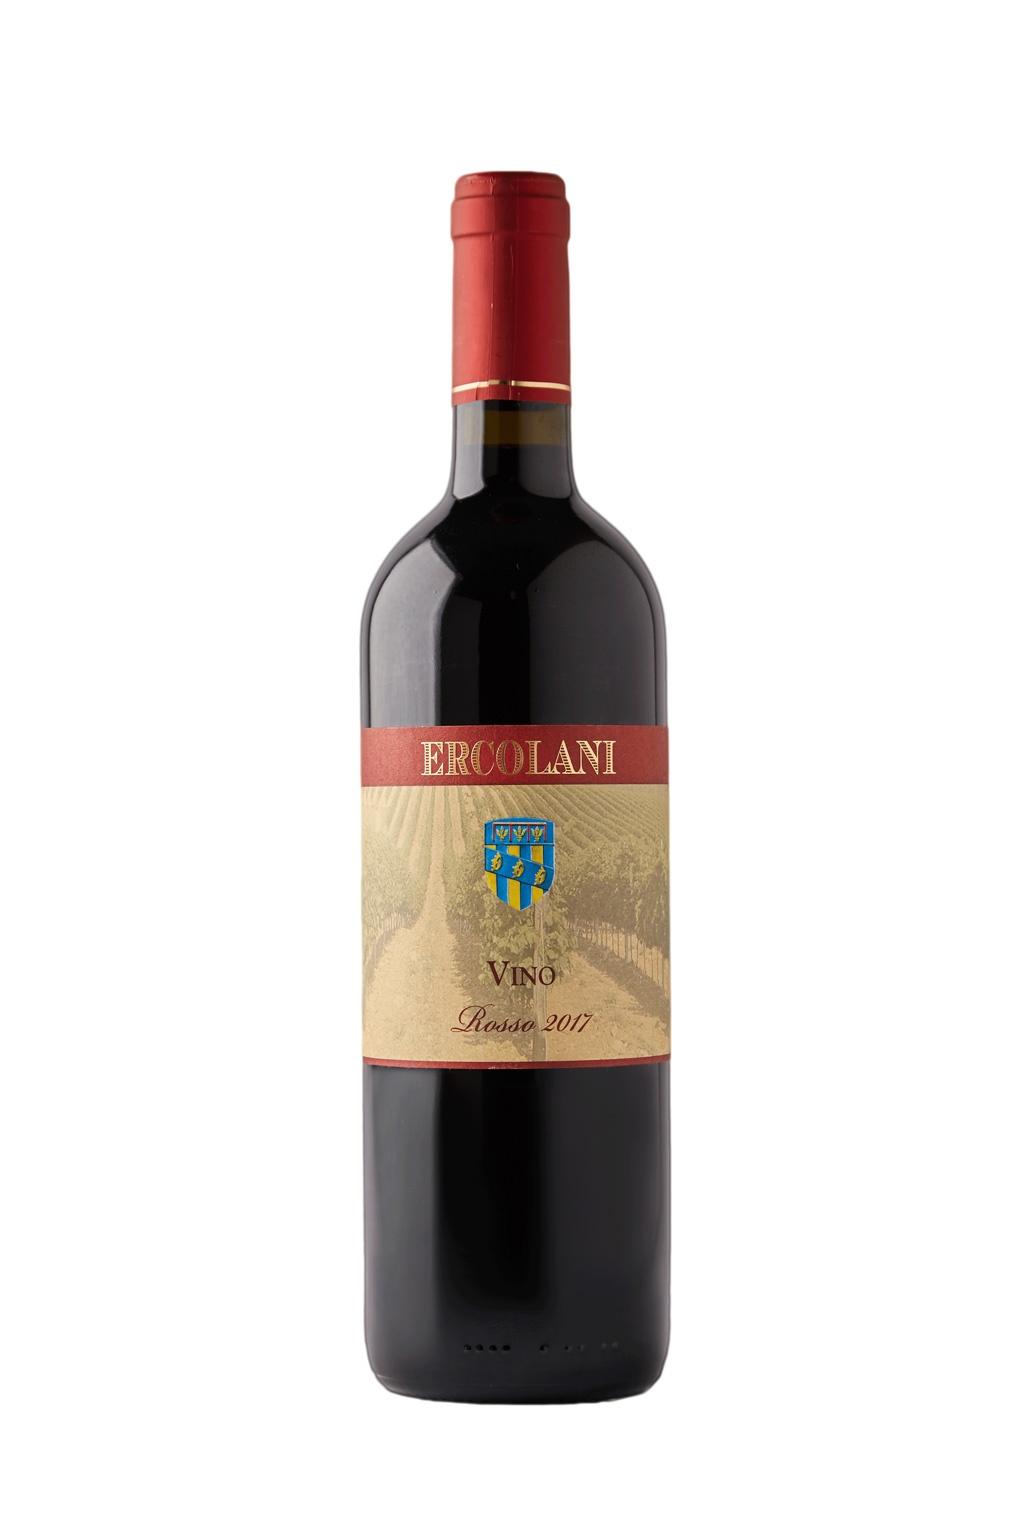 Rotwein igt Ercolani 2016